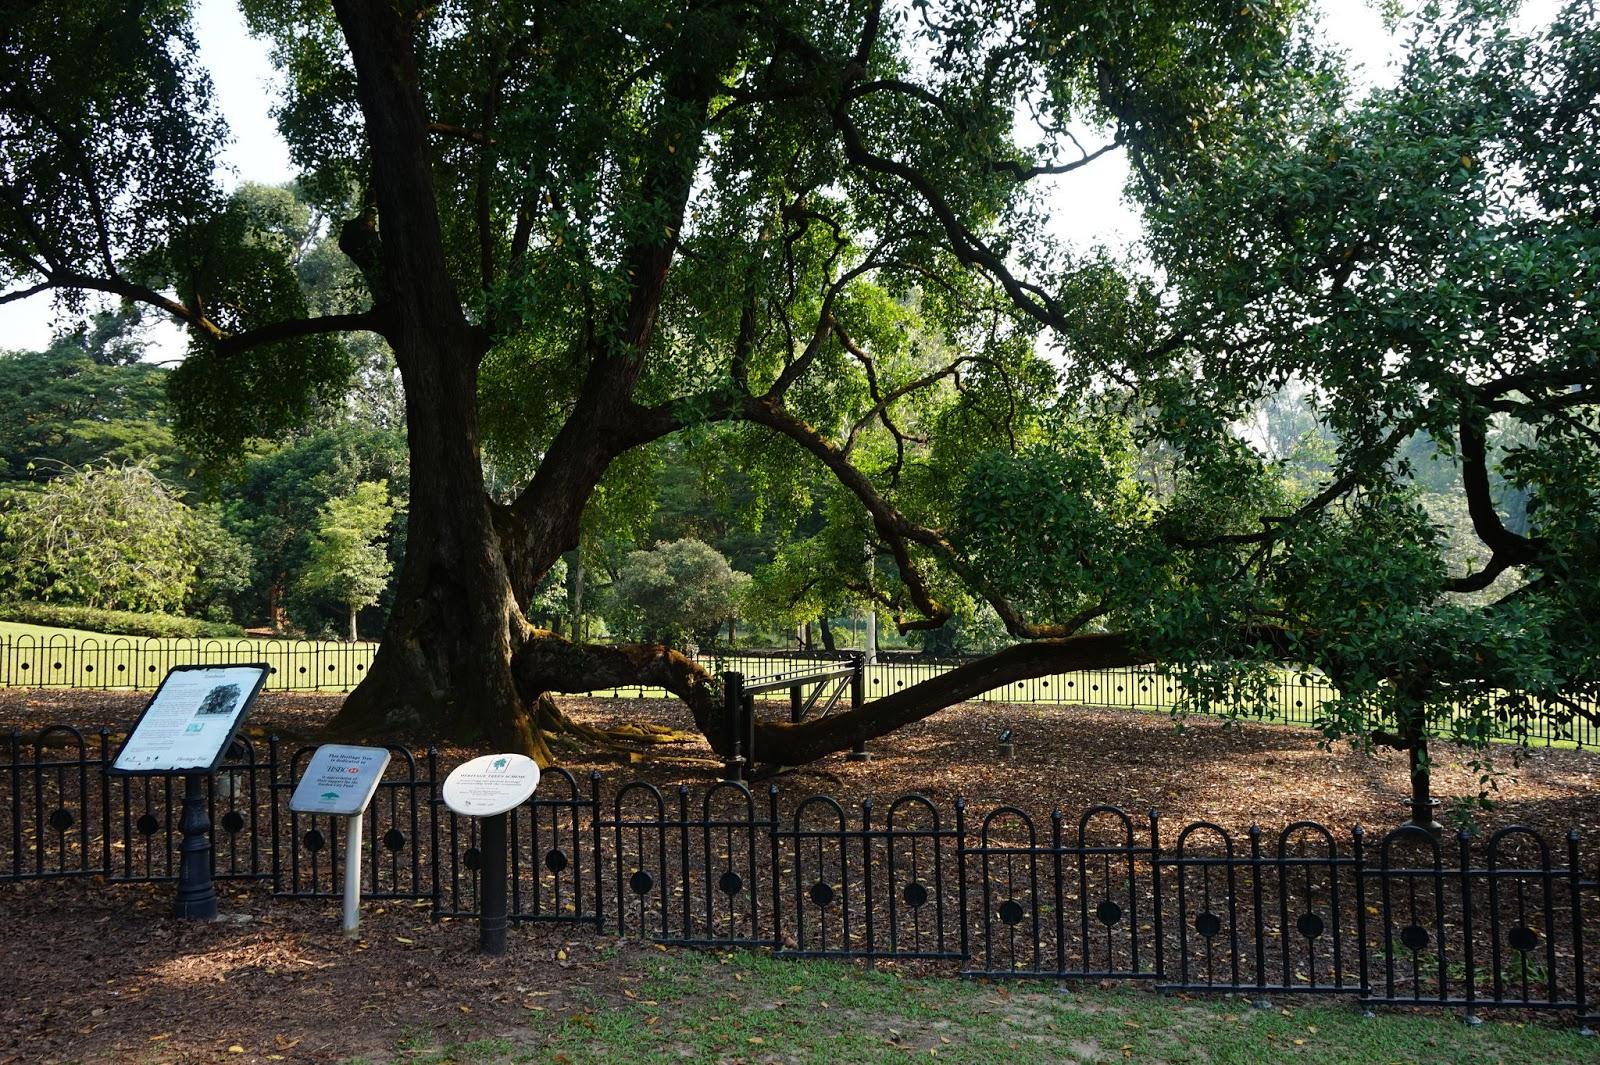 the tembusu tree at the botanic Tembusu 4 kapok tree 3 how to get to singapore botanic gardens by foot: entrance to the gardens is easy through the gardens' major entrances: tanglin gate, nassim.